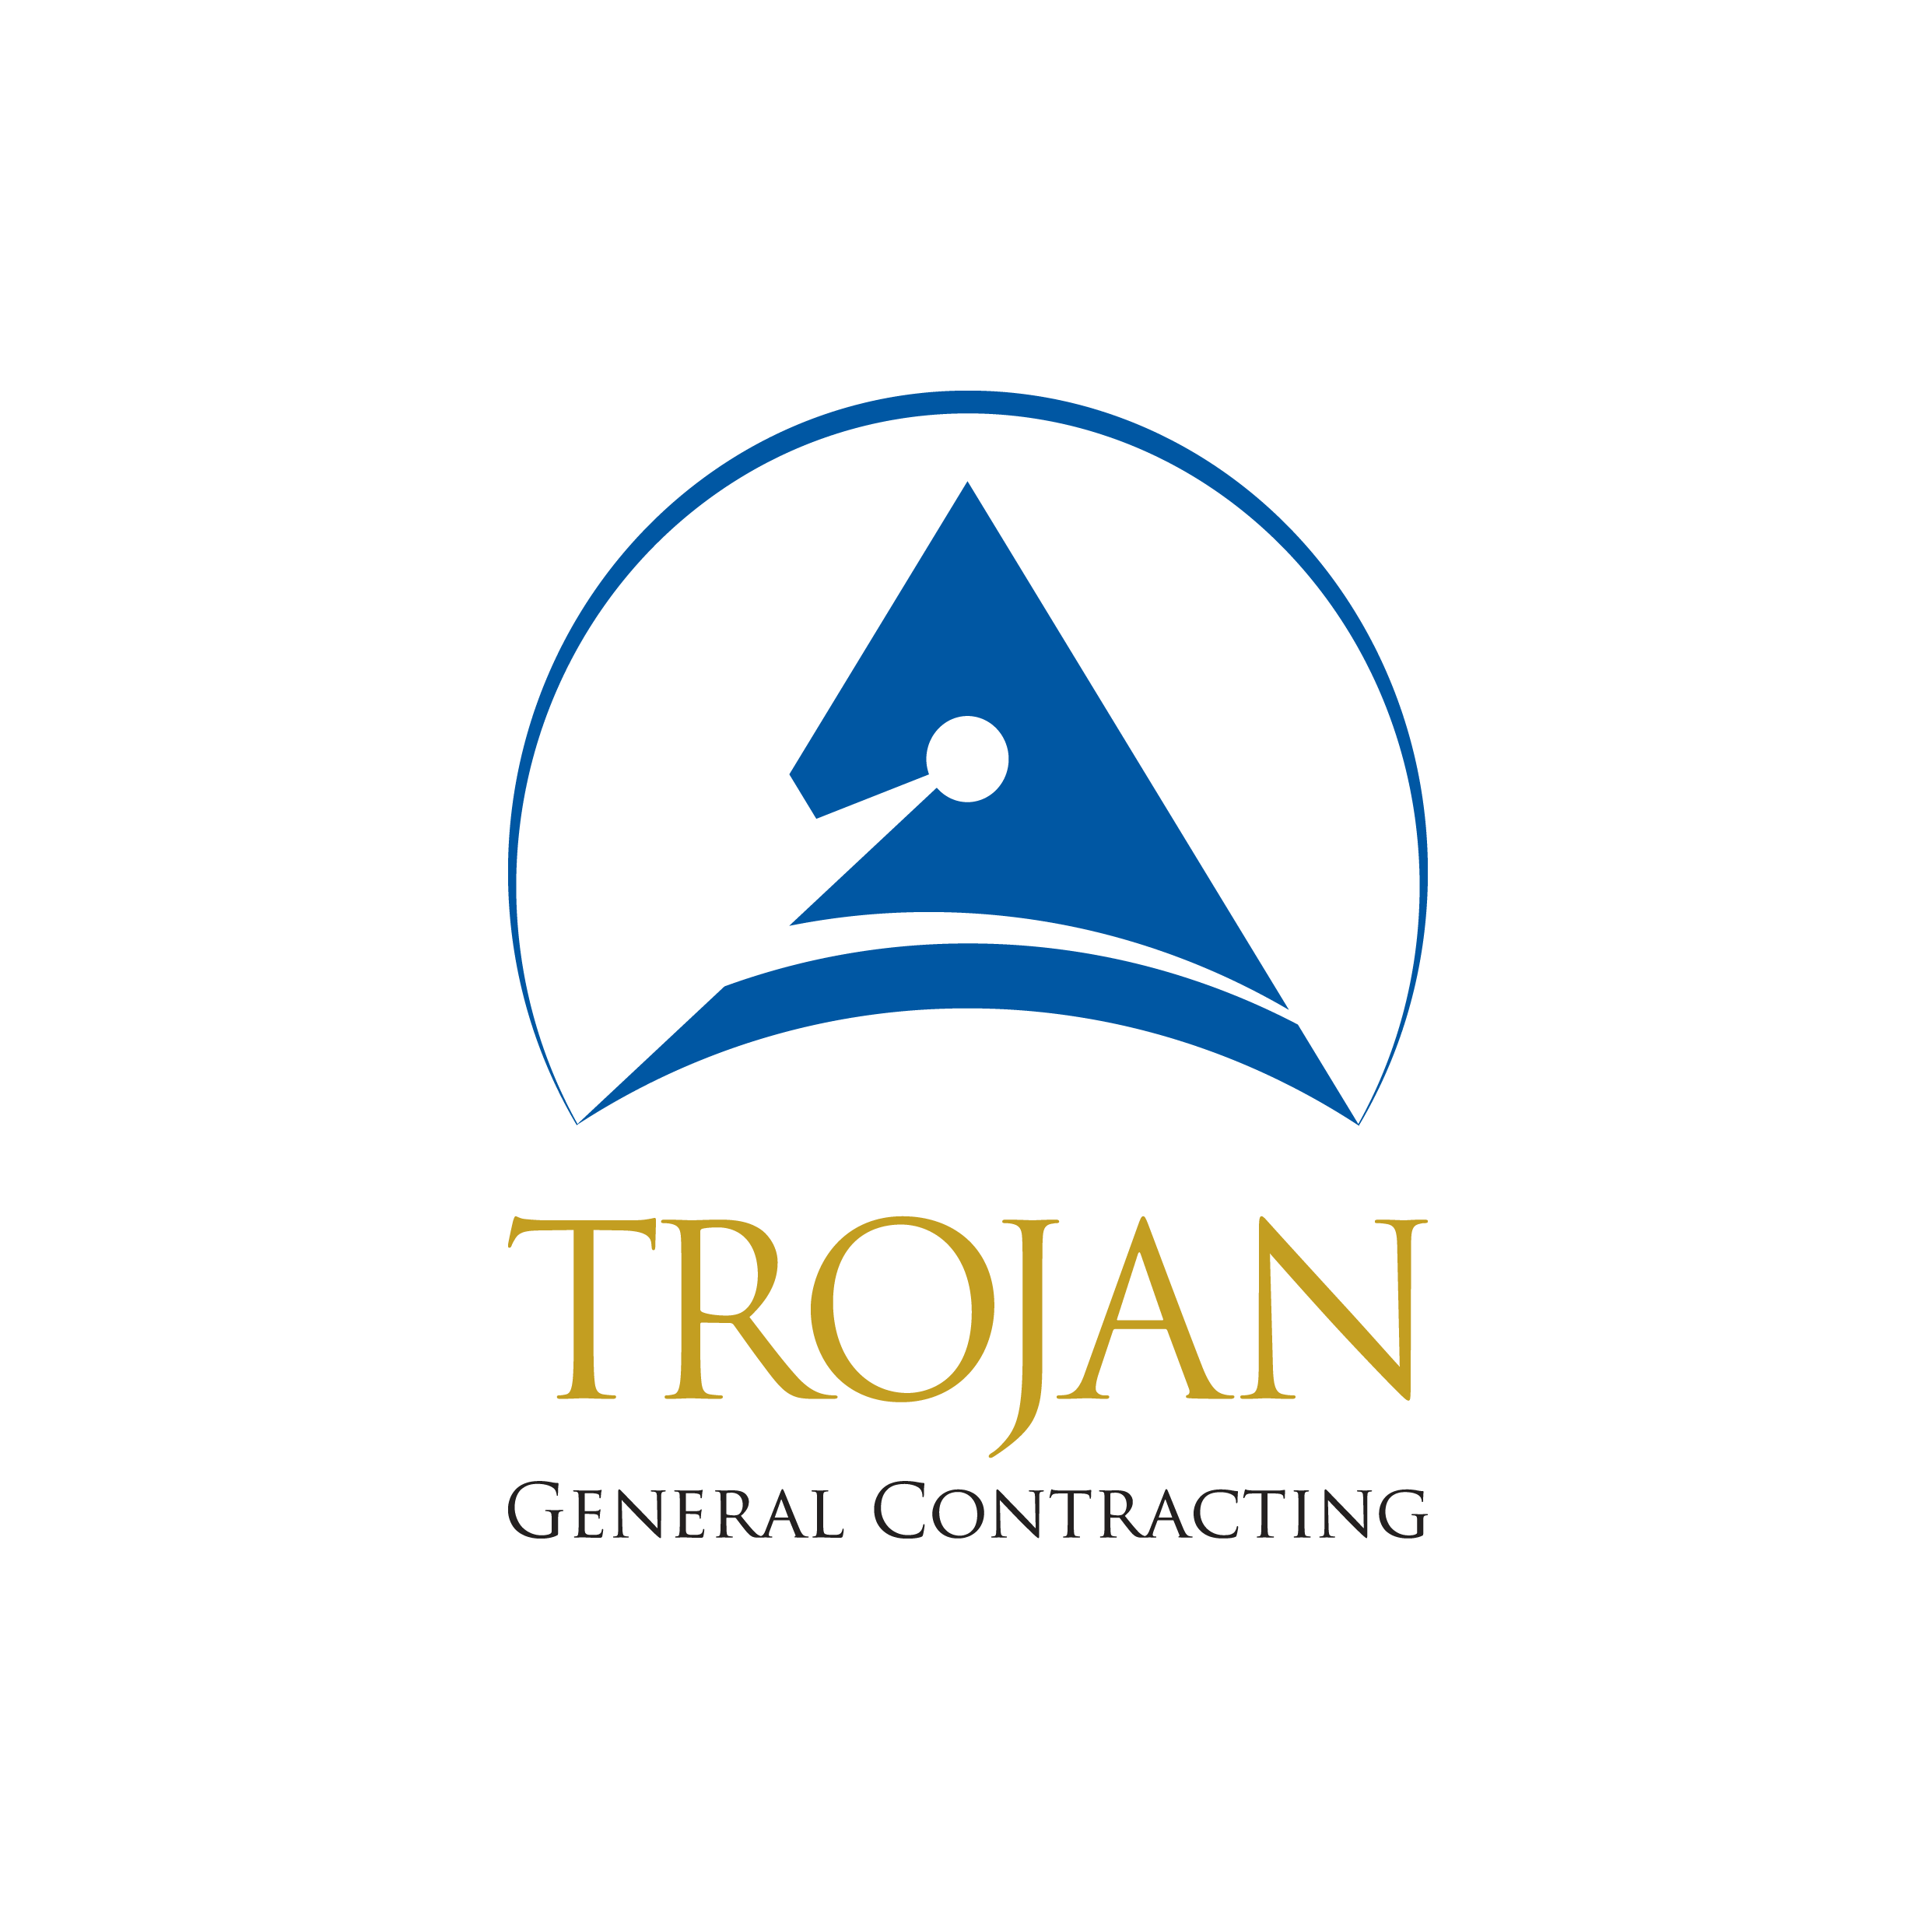 Trojan General Contracting